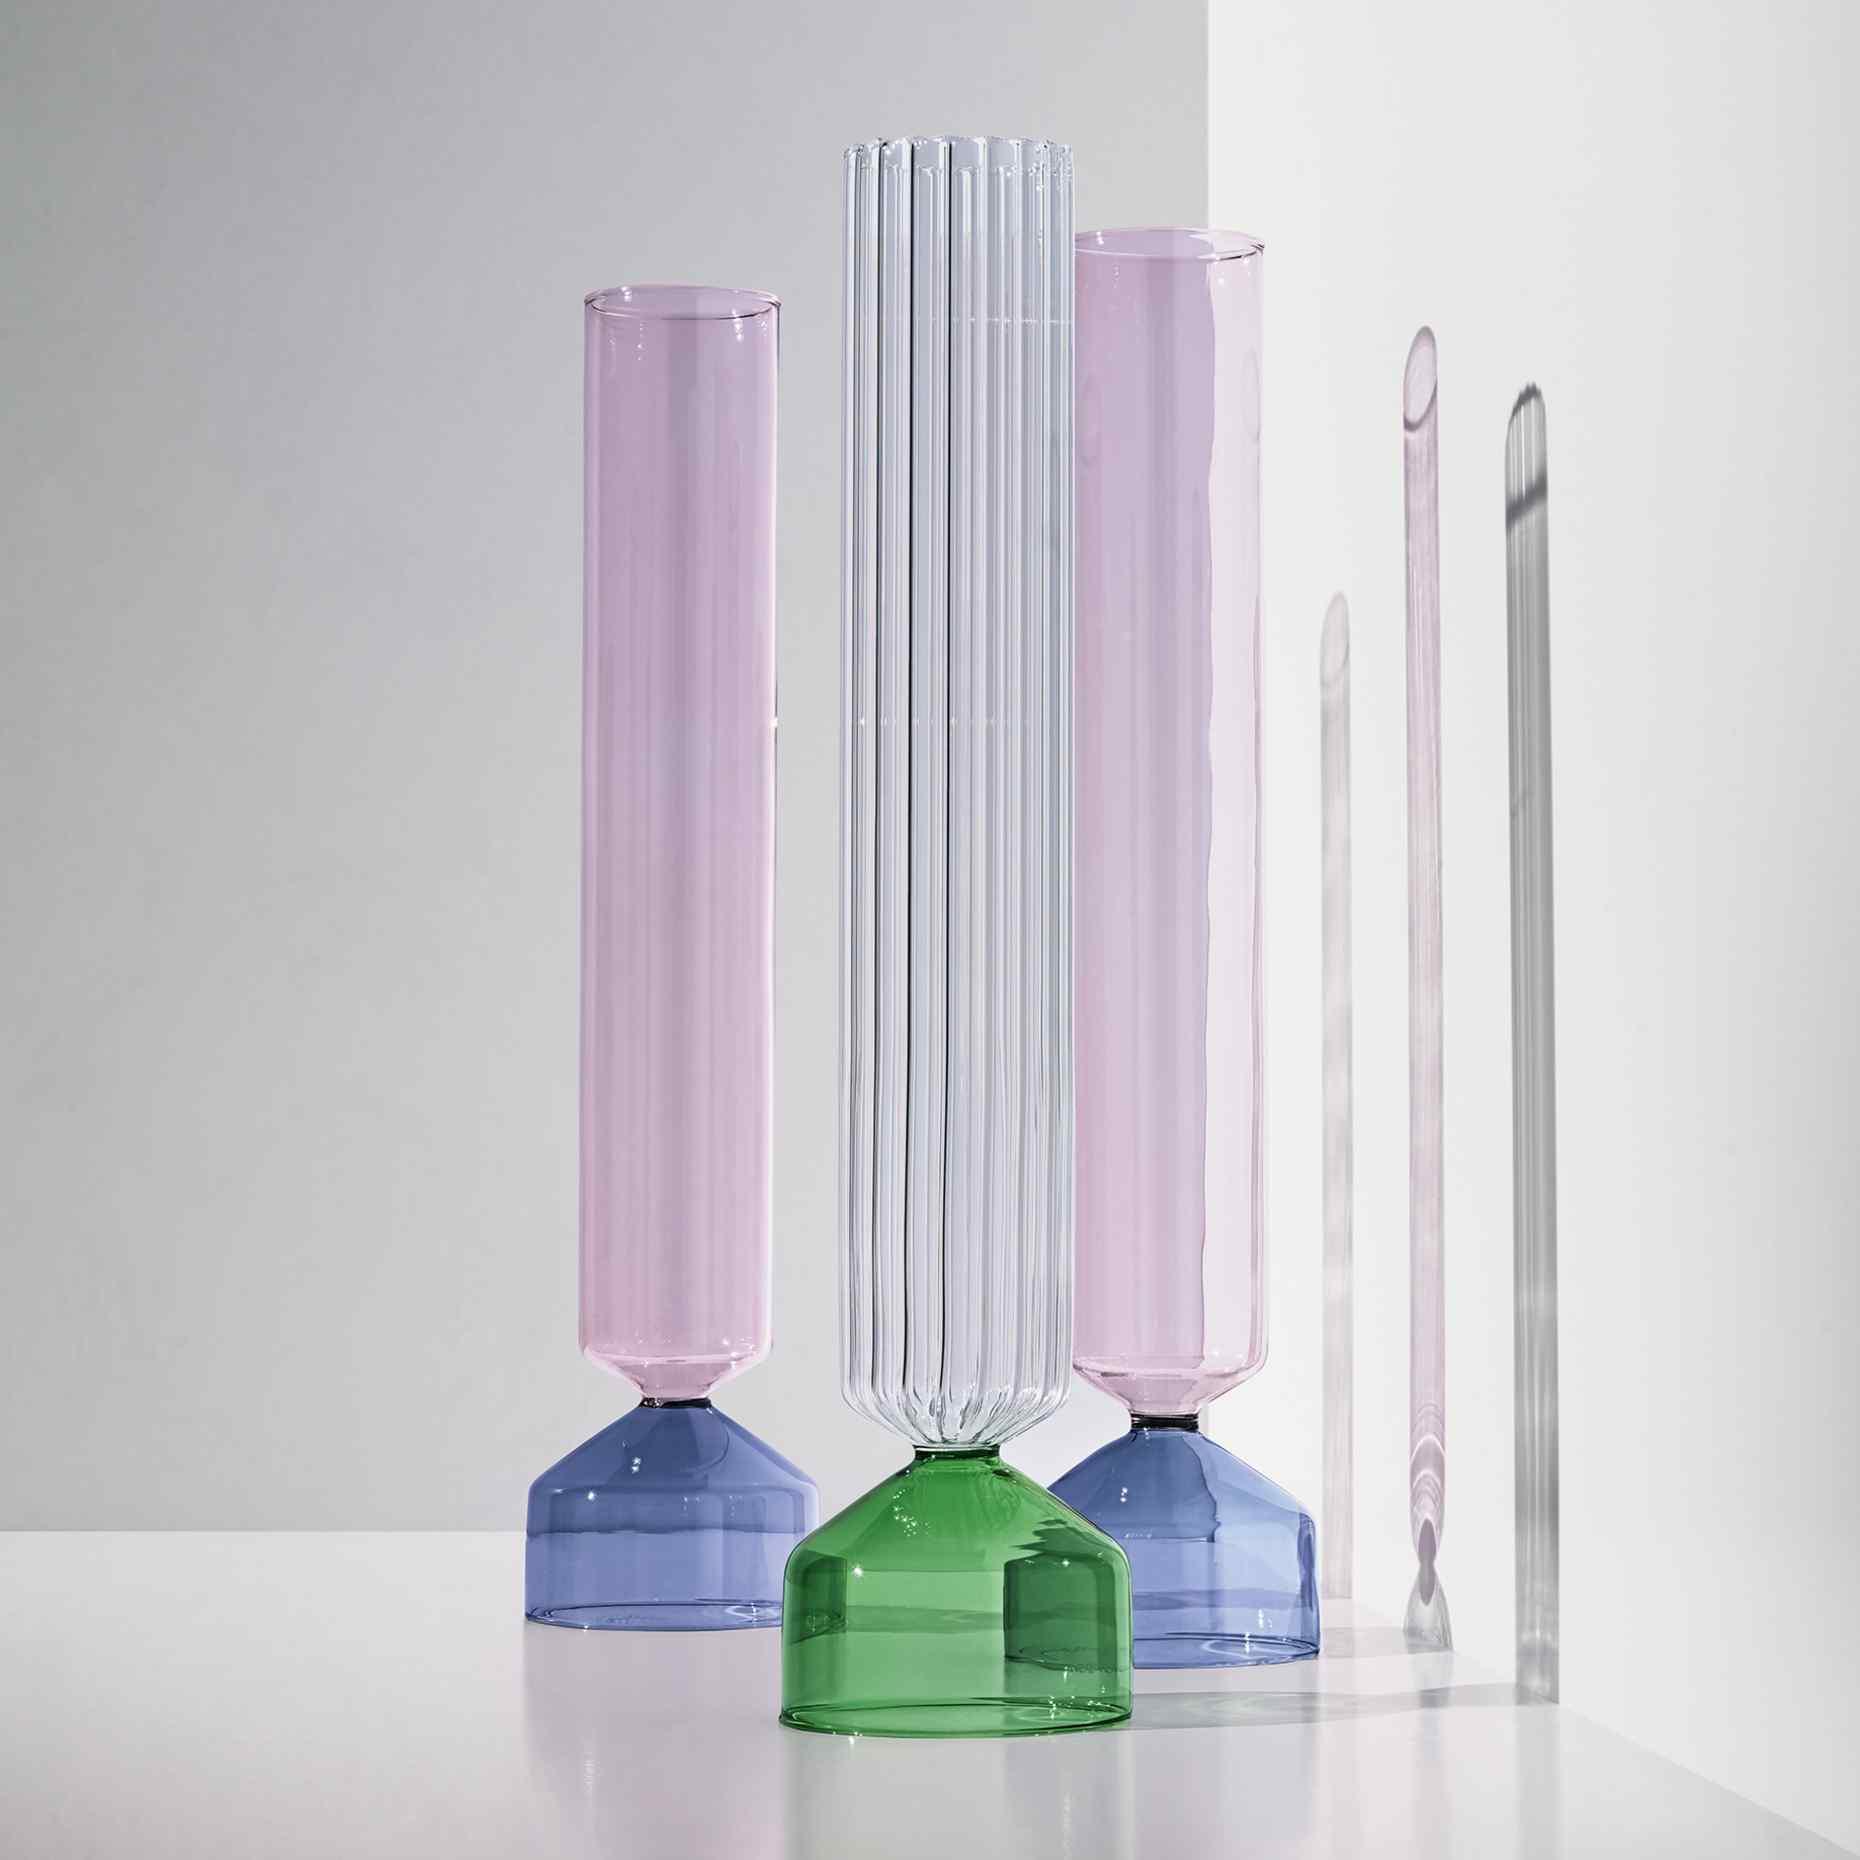 Ichendorf Milano Hourglass Vases